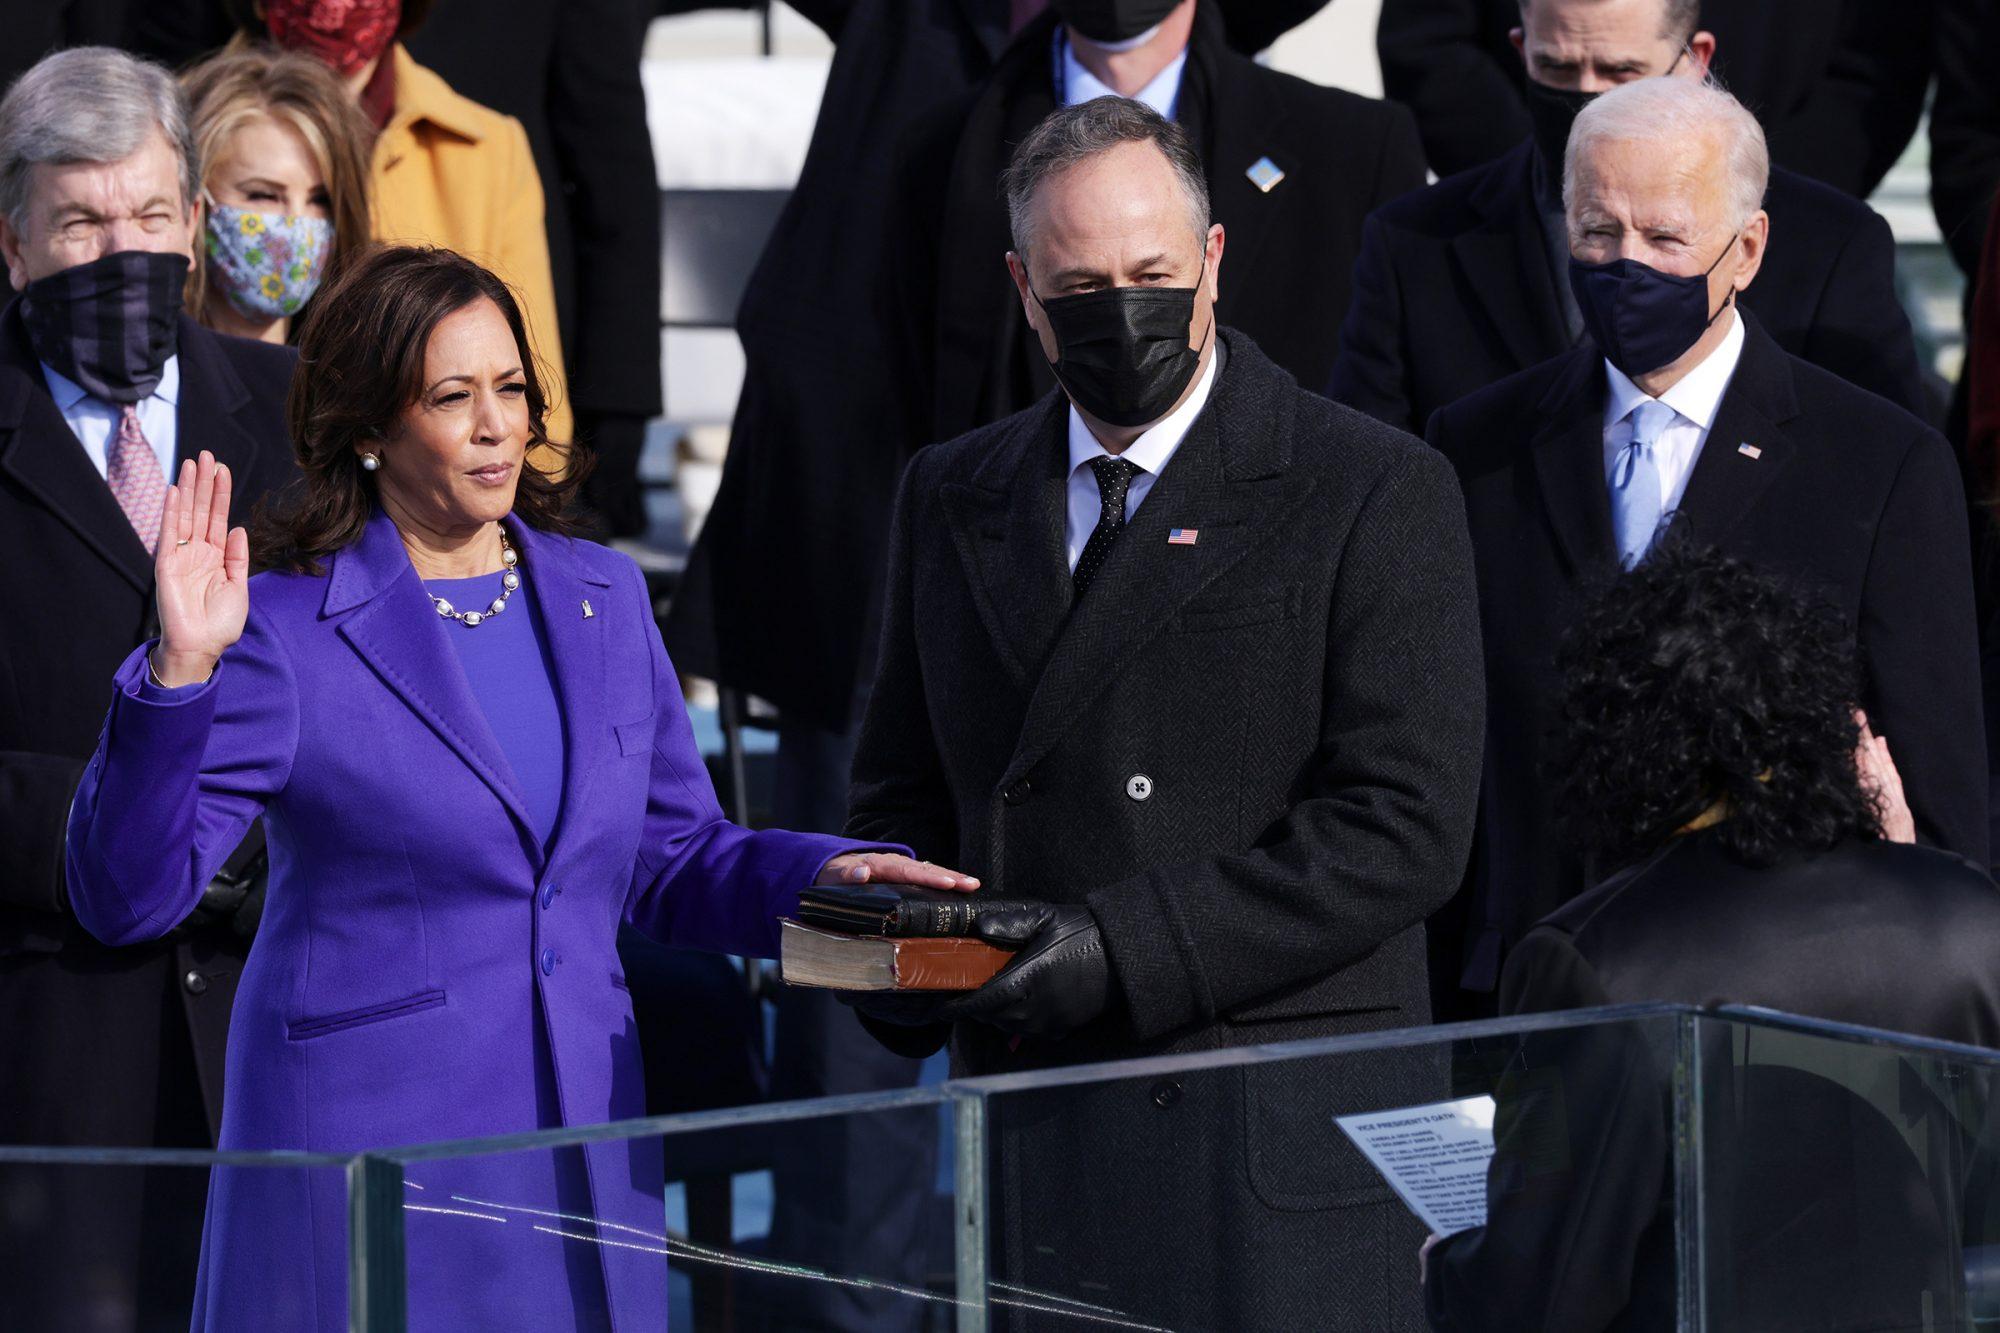 Harris being sworn